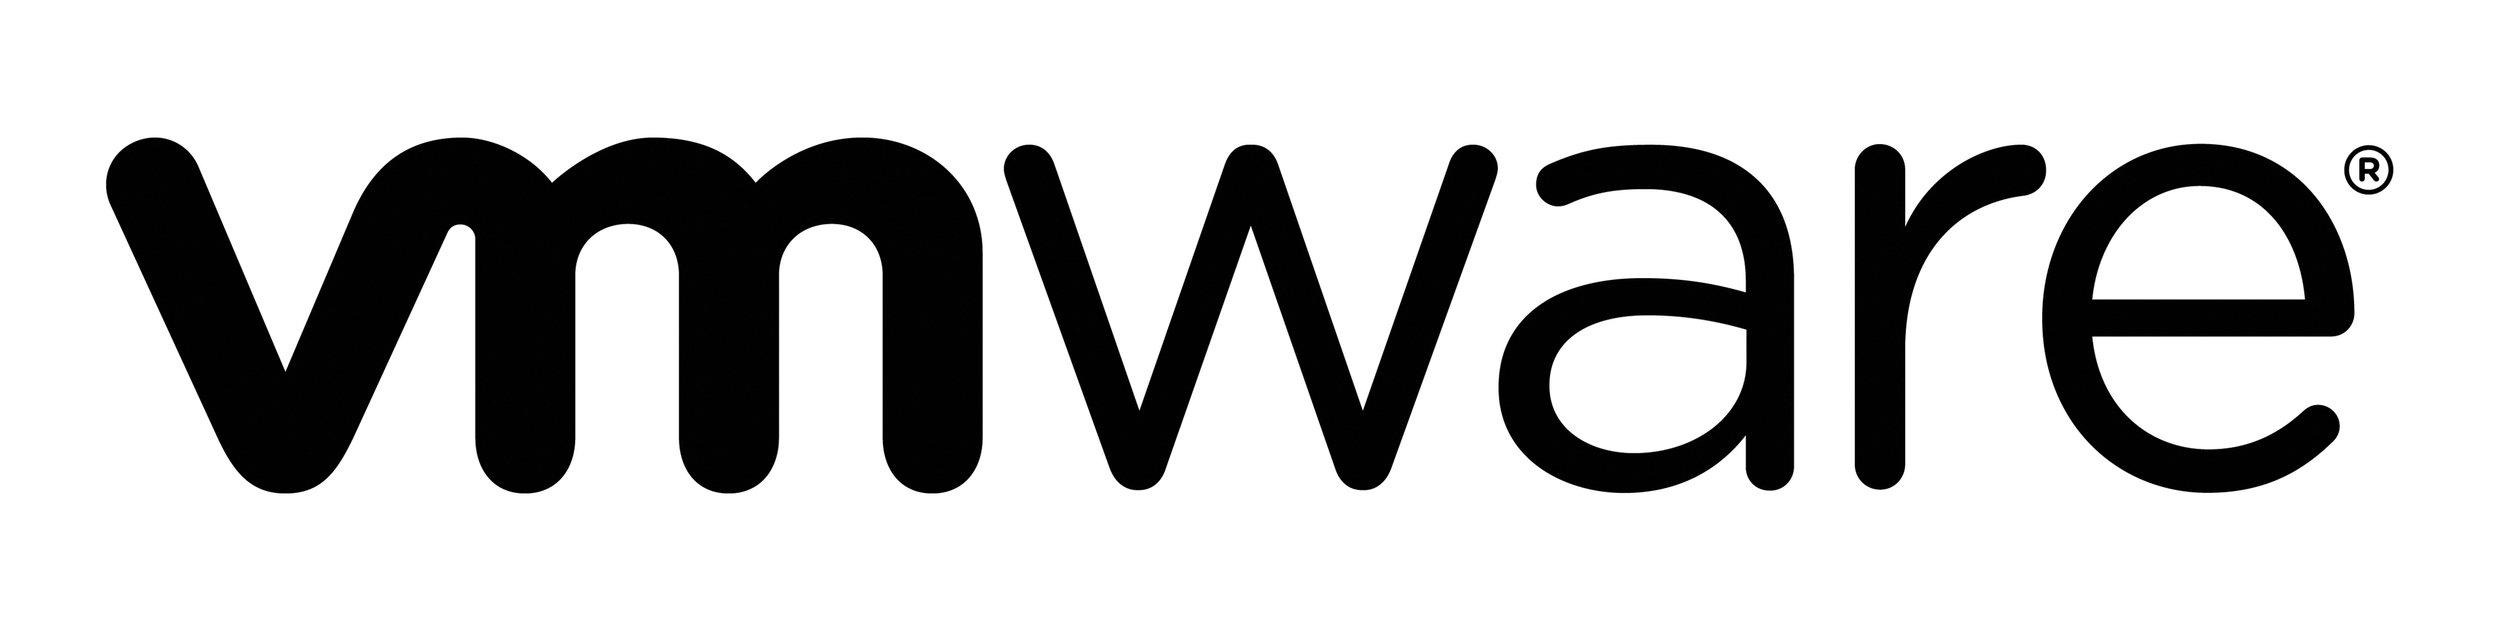 vmware-logo-black.jpg